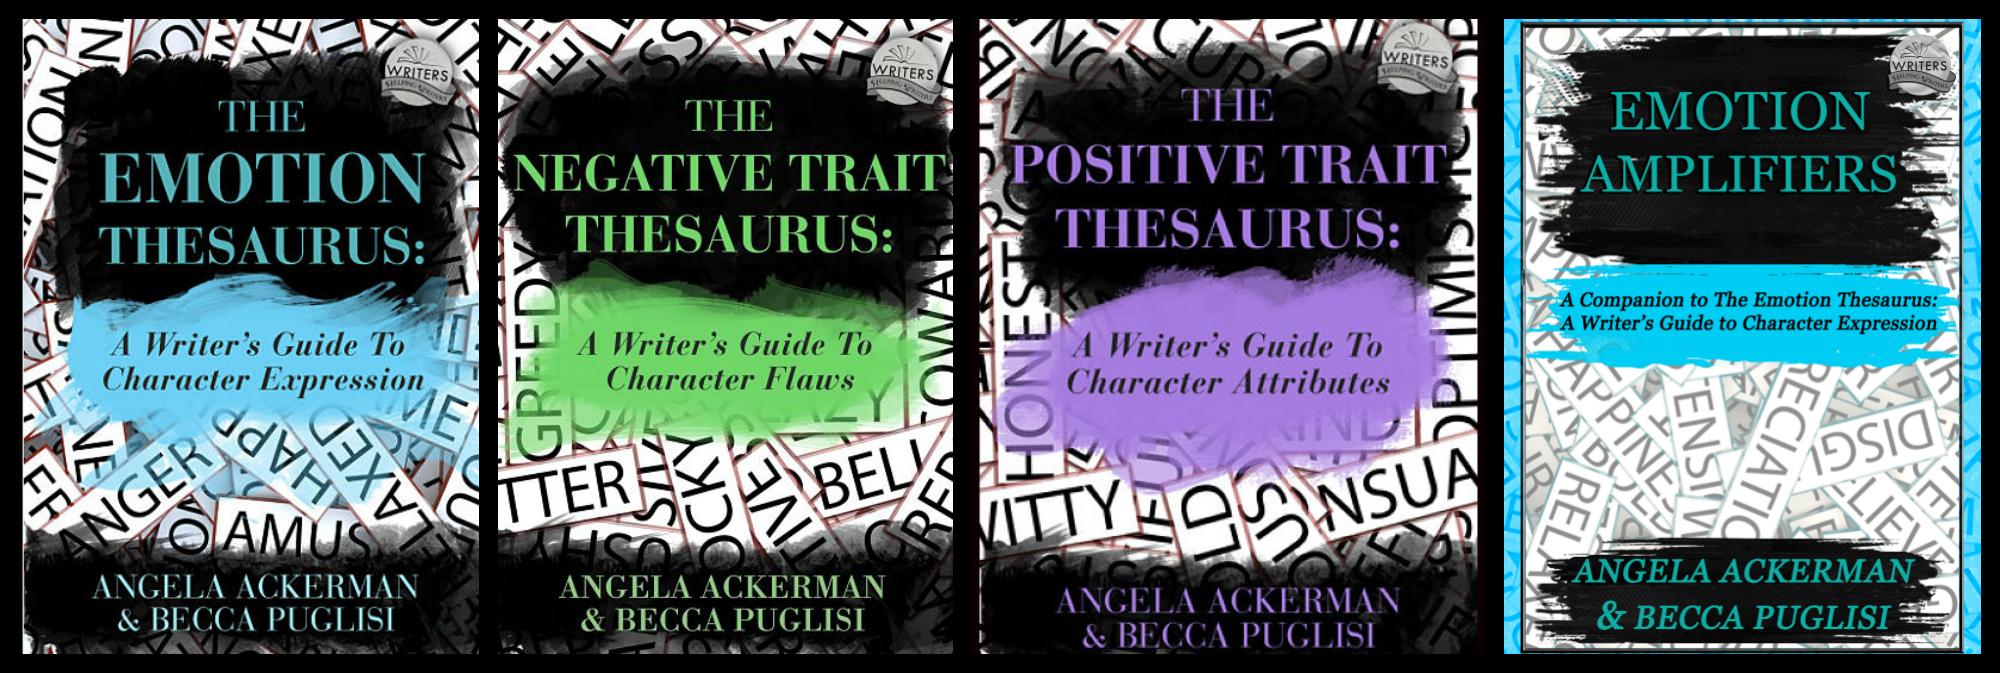 collage_4_Descriptive Thesaurus Books